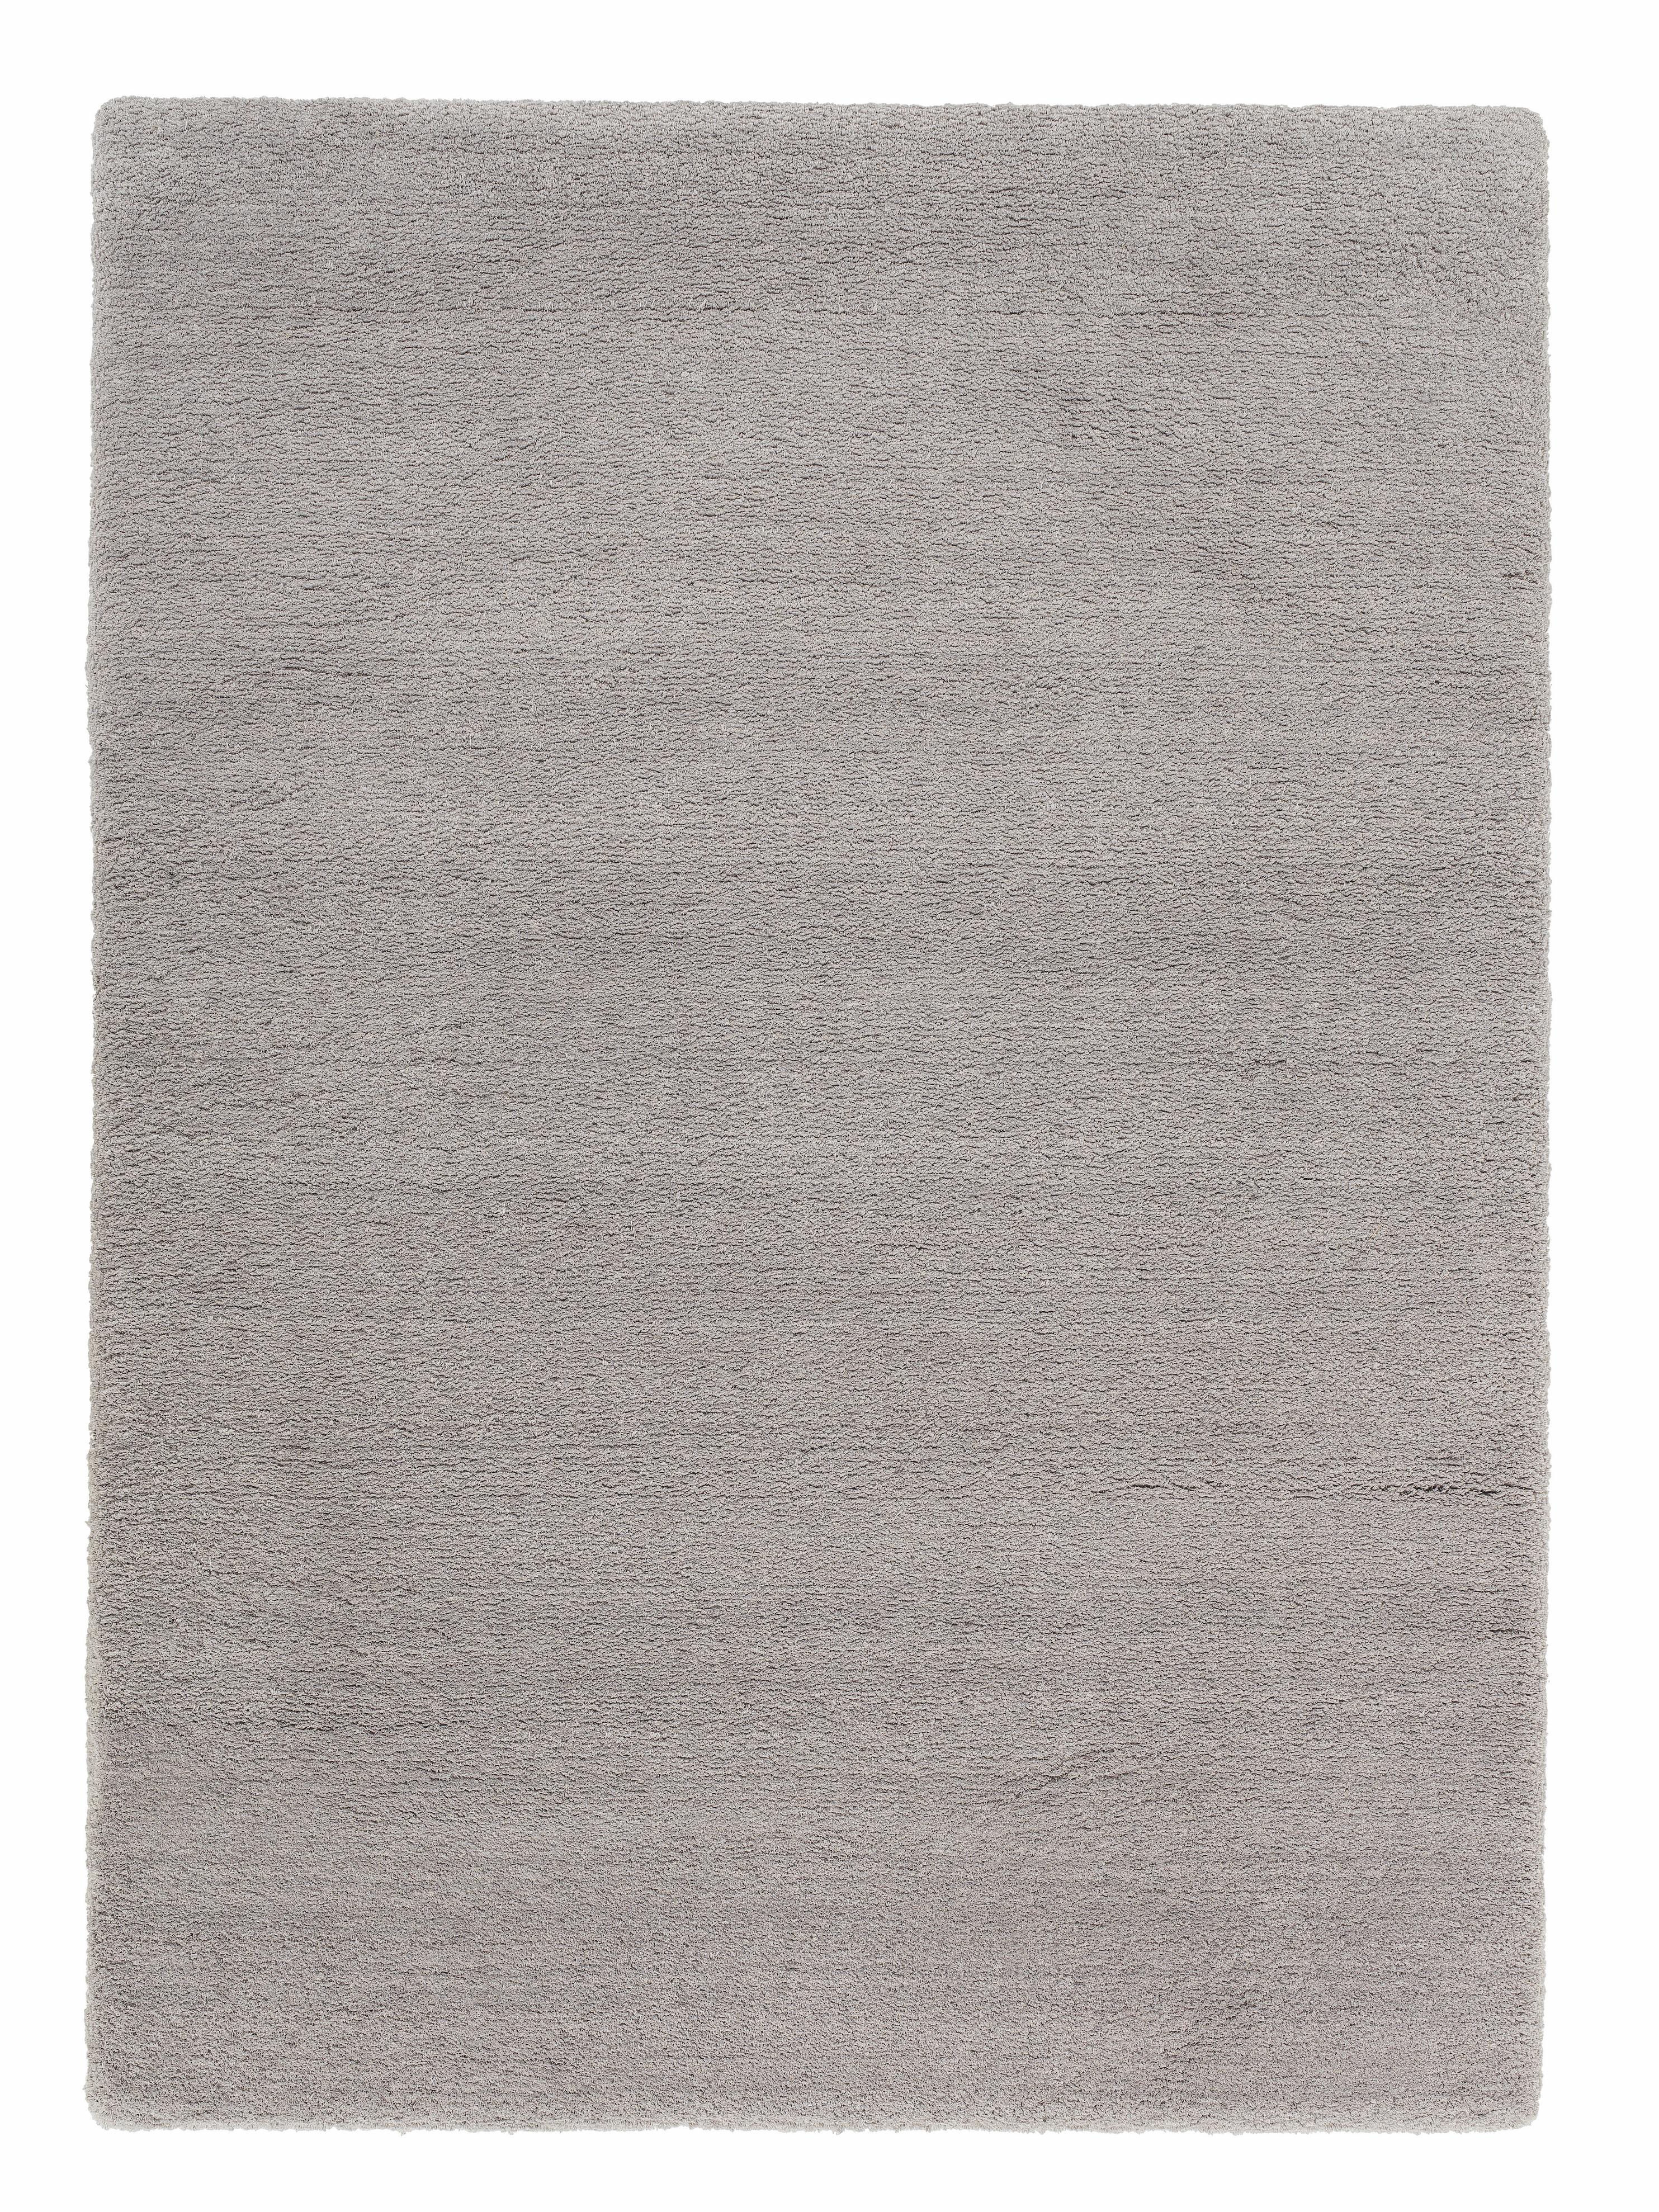 Astra - Golze koberce Kusový koberec Livorno Deluxe 170004 Silver - 120x180 cm